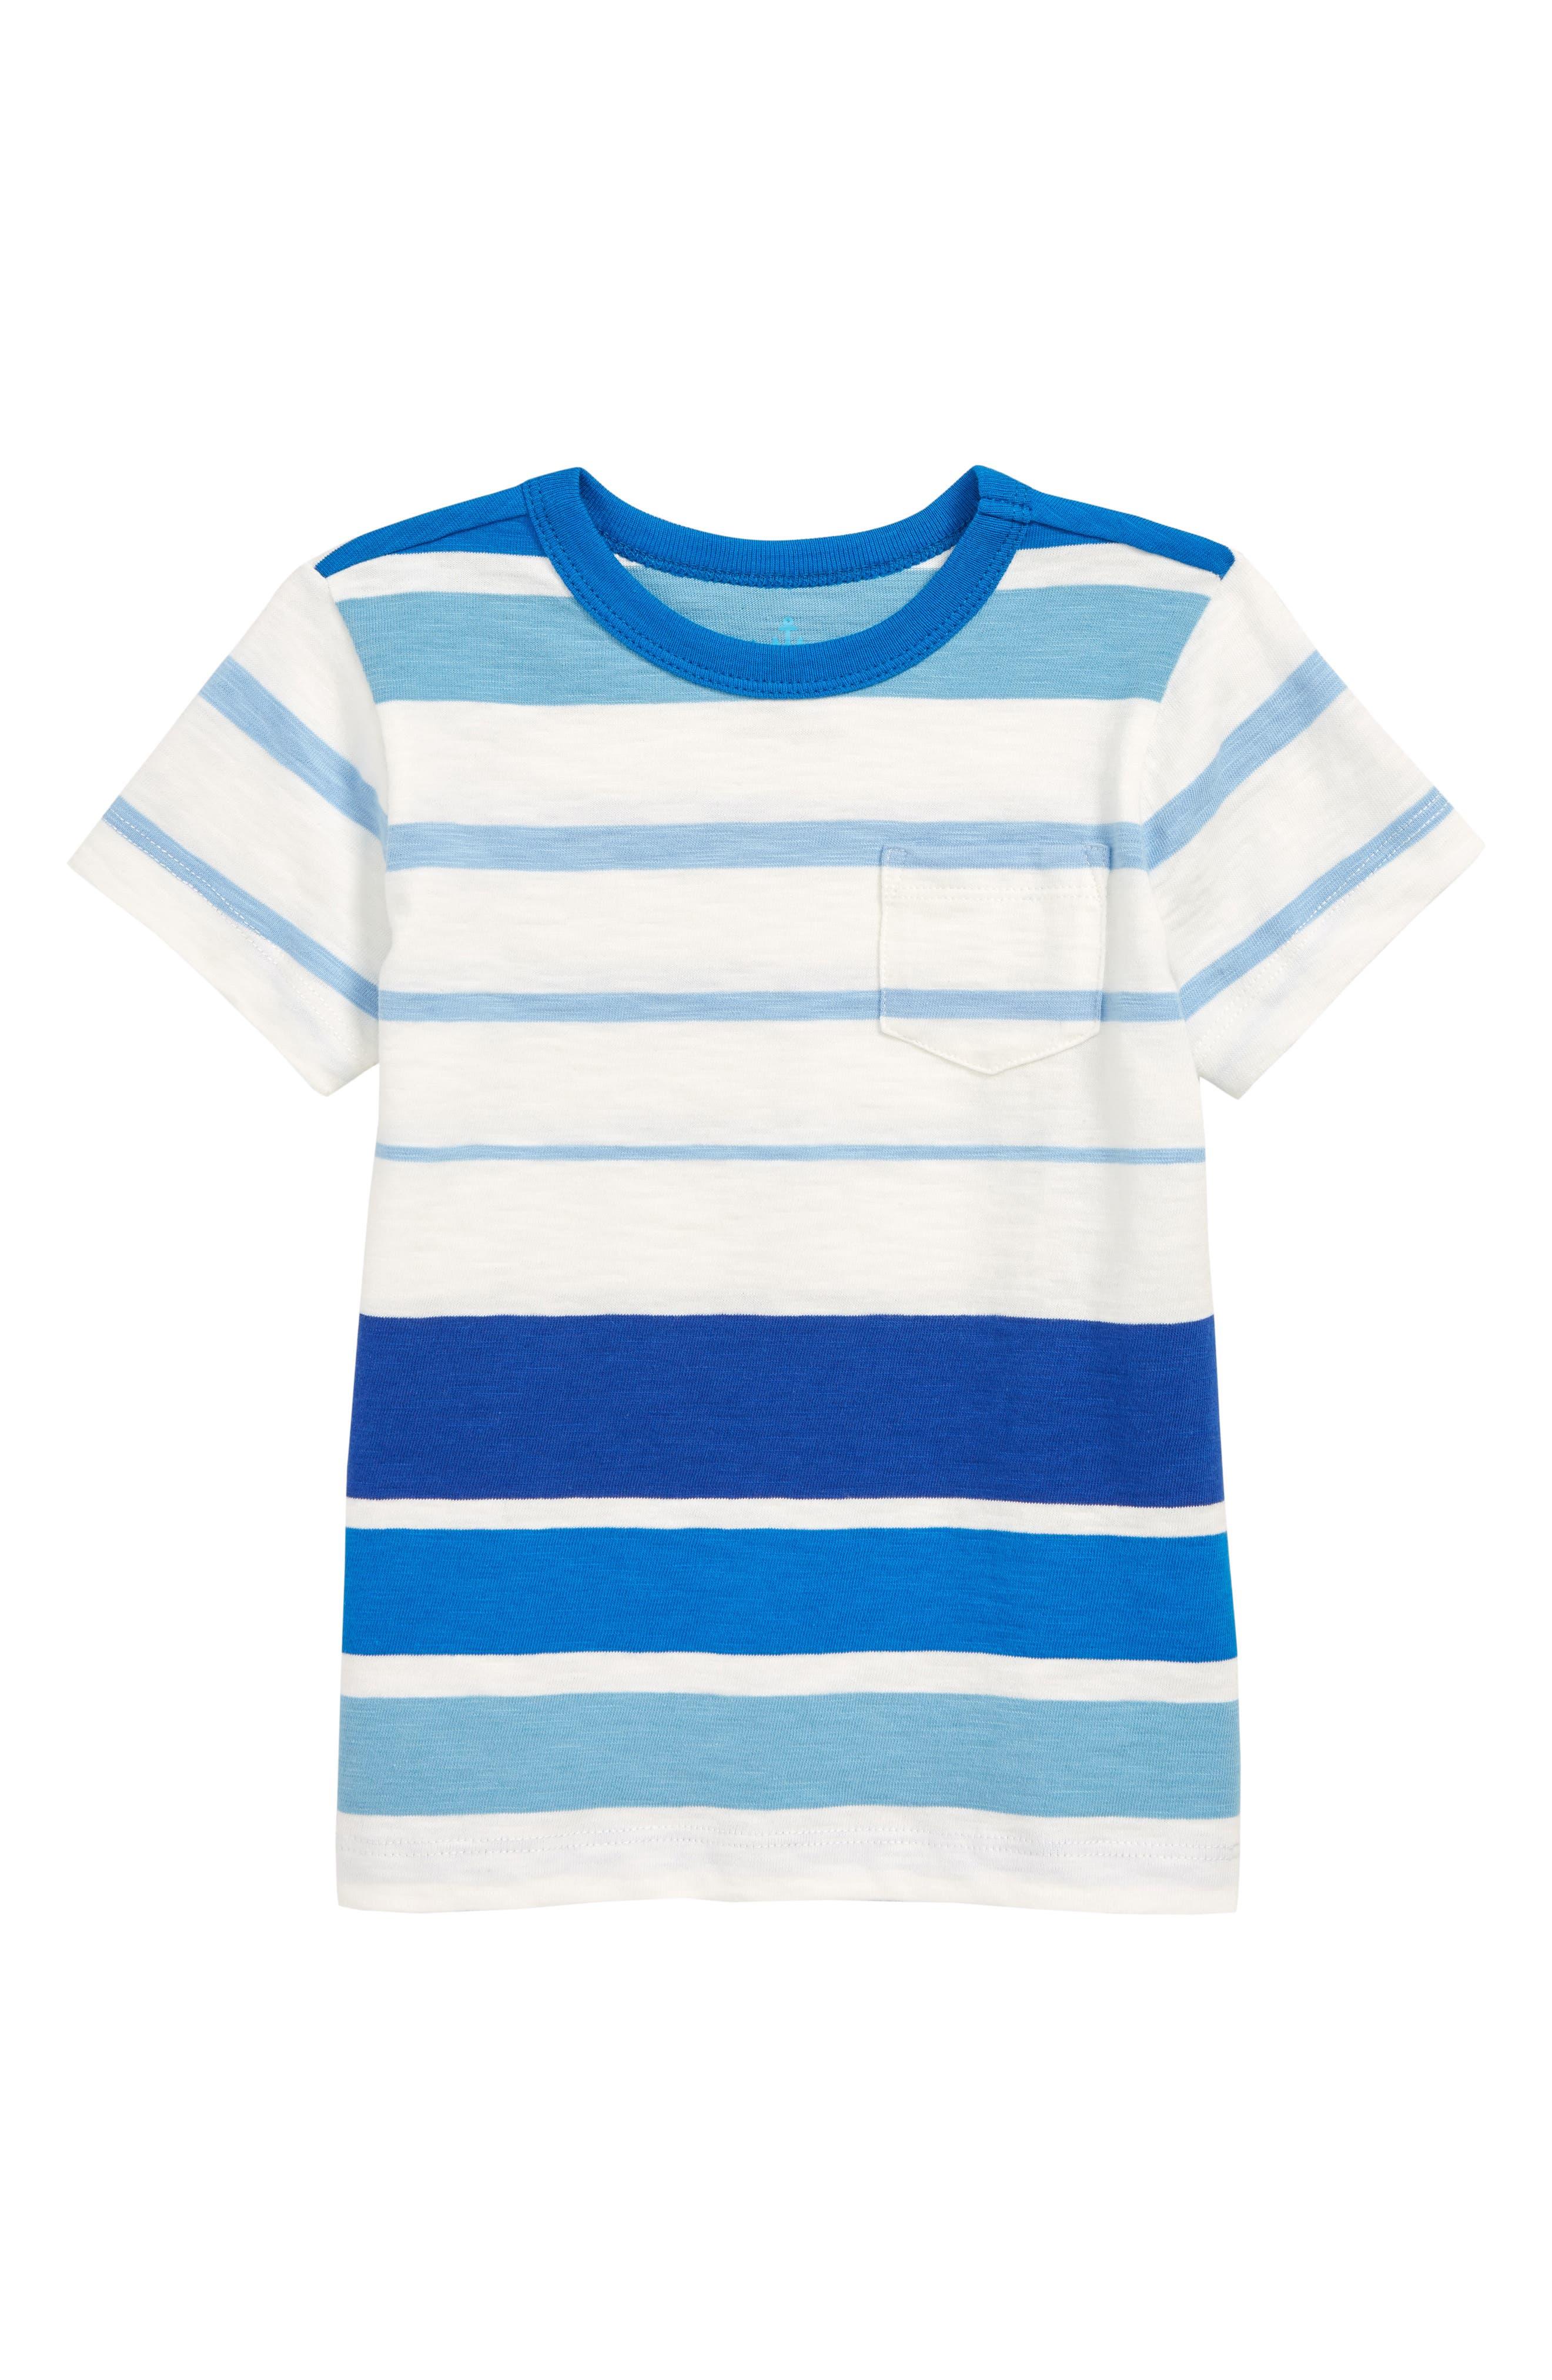 Boys Crewcuts By Jcrew Mixed Stripe Pocket TShirt Size 67  Blue